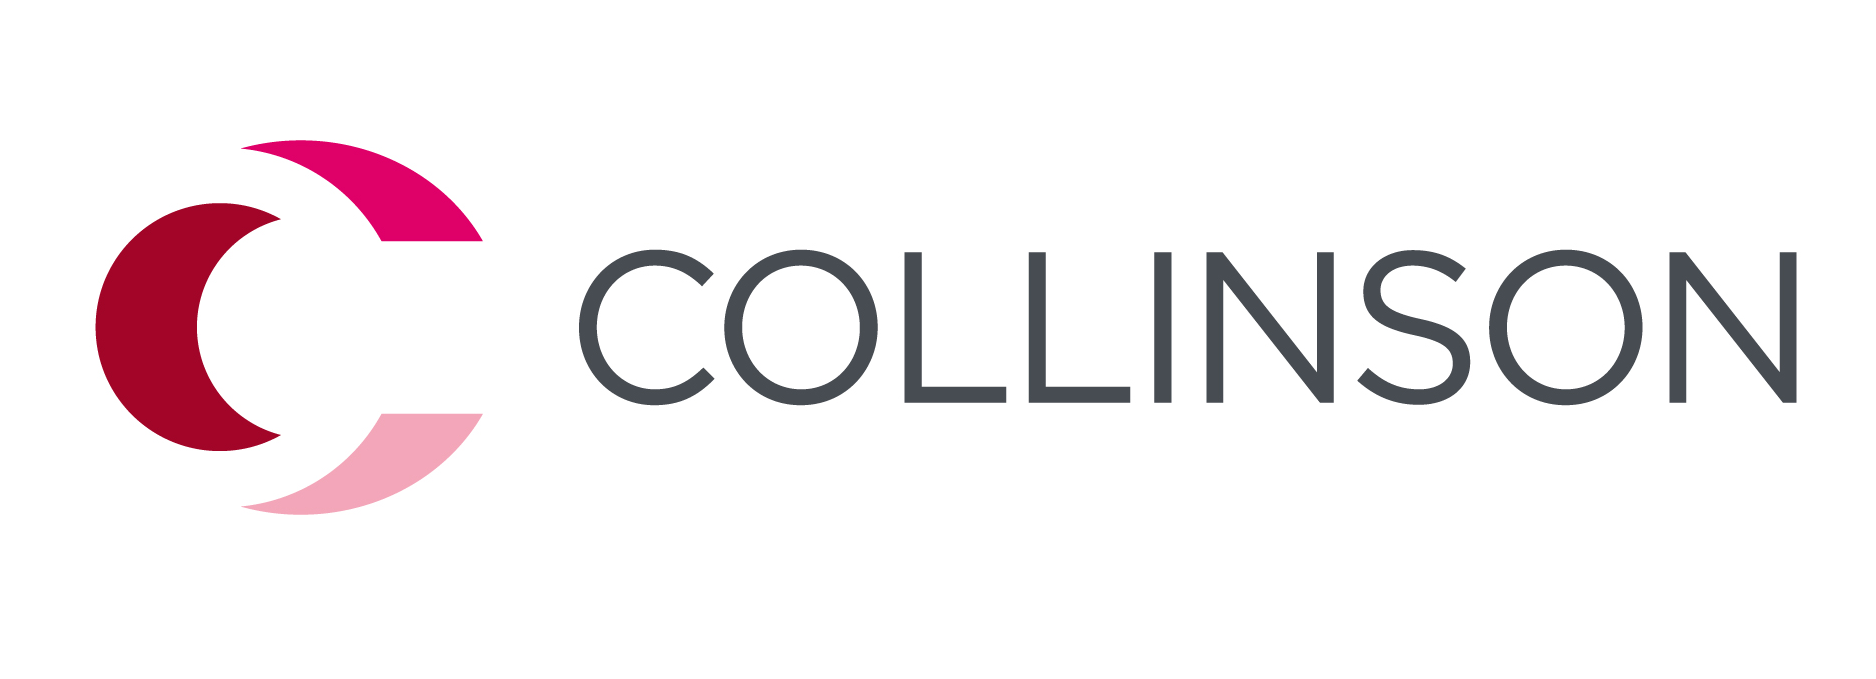 Collinson Logo